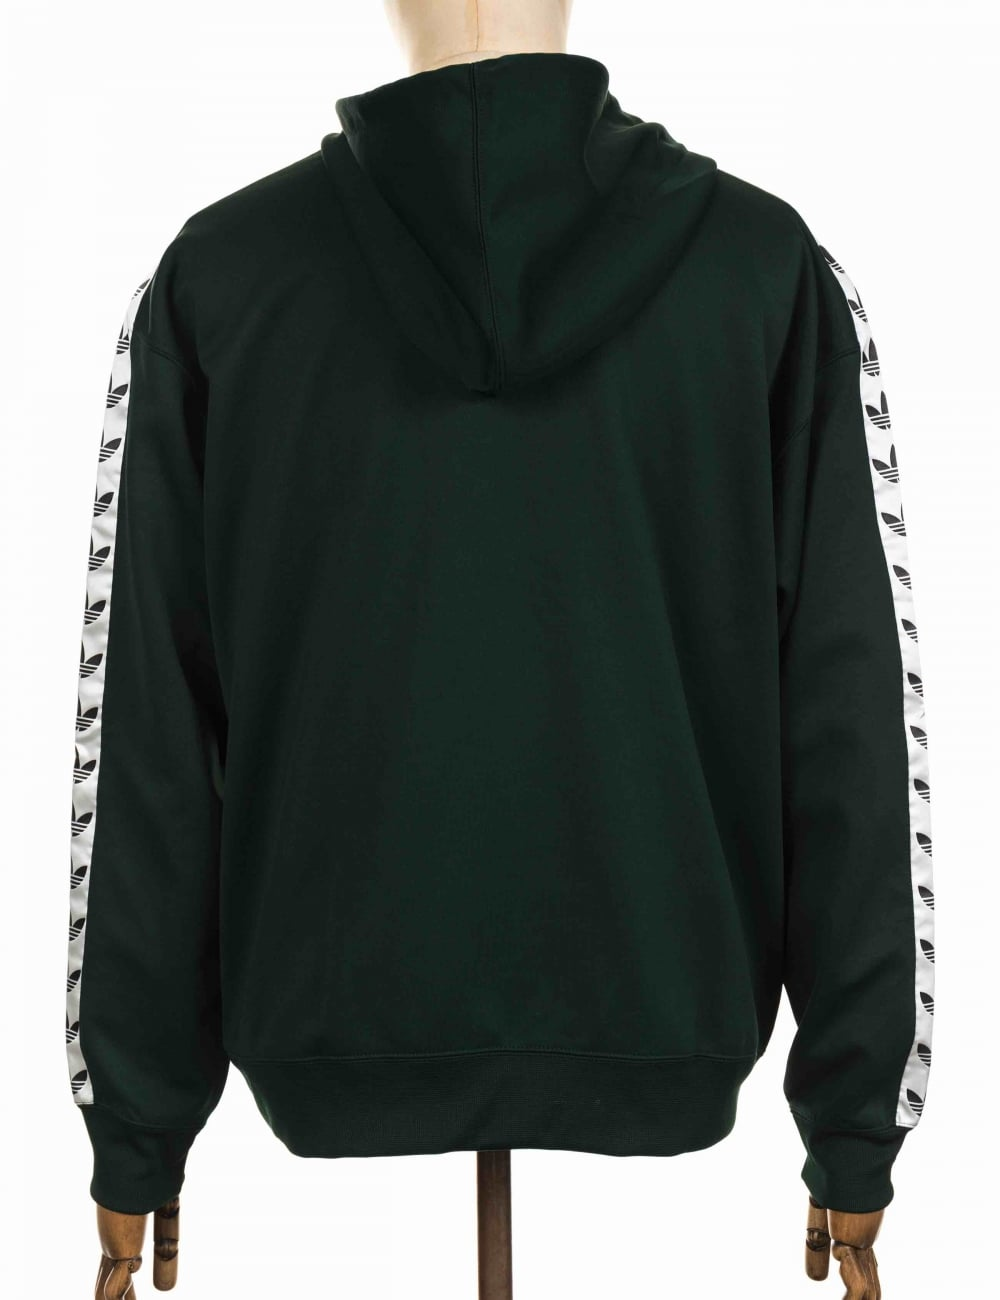 adidas Originals TNT Trefoil Crewneck Sweatshirt Green Night